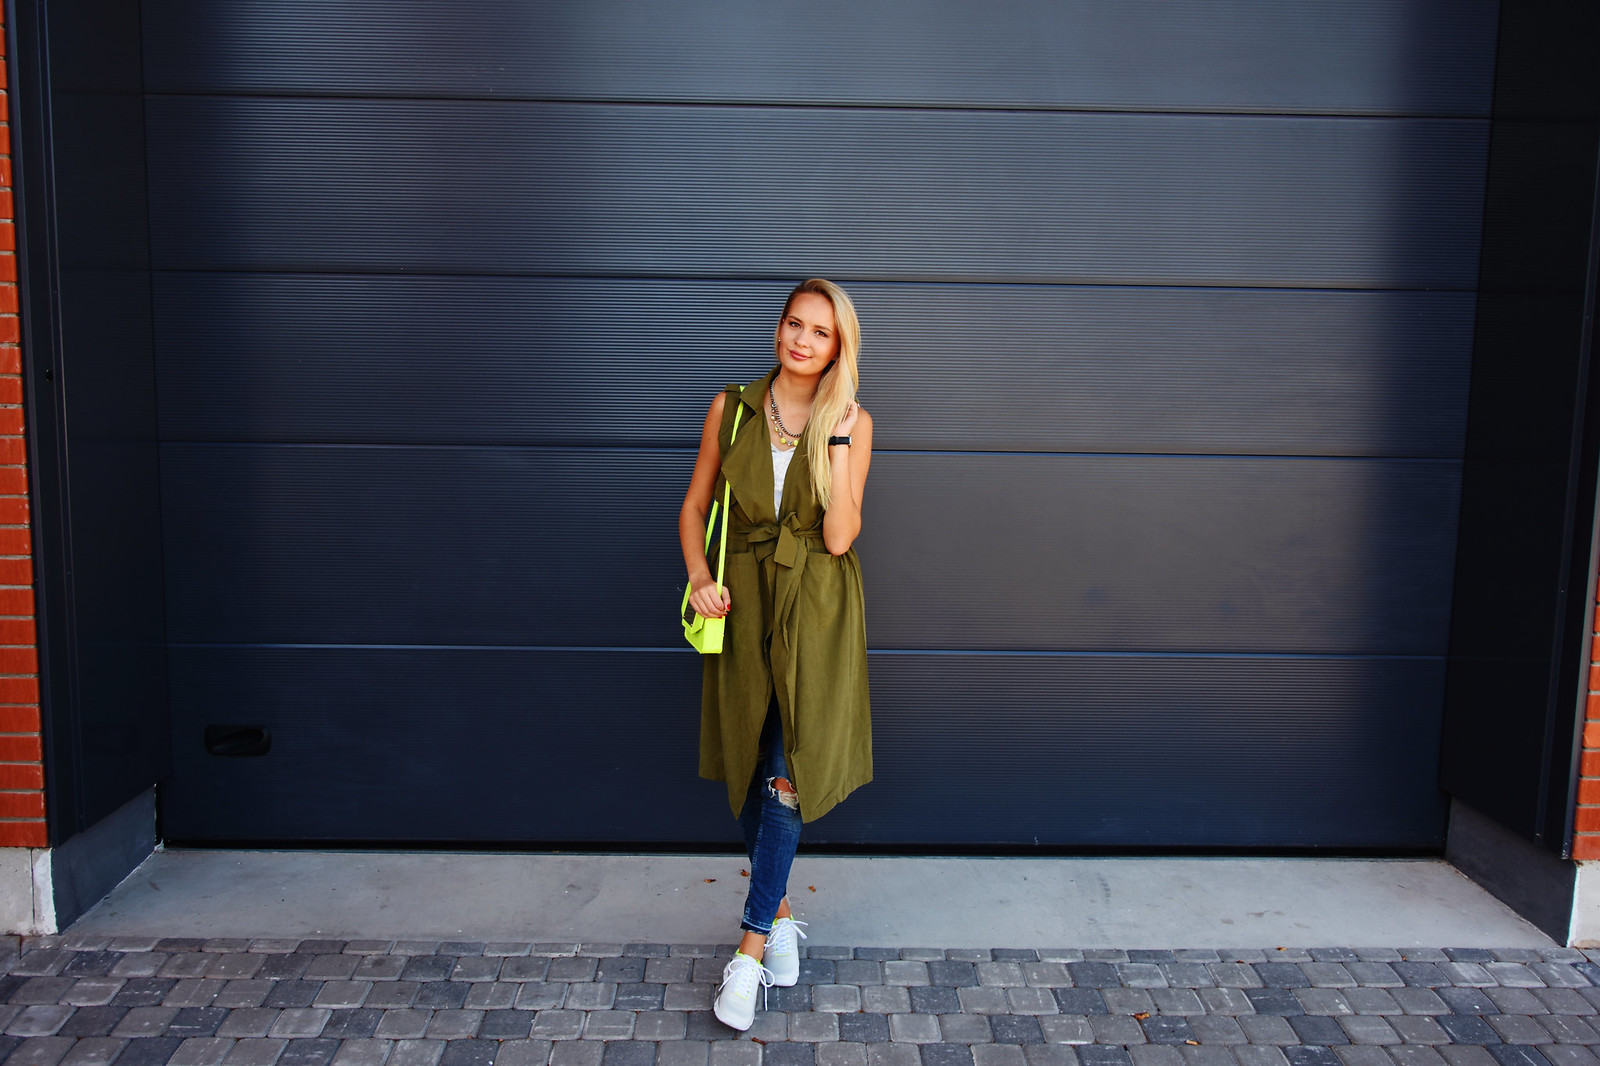 Latvian fashion and lifestyle blogger